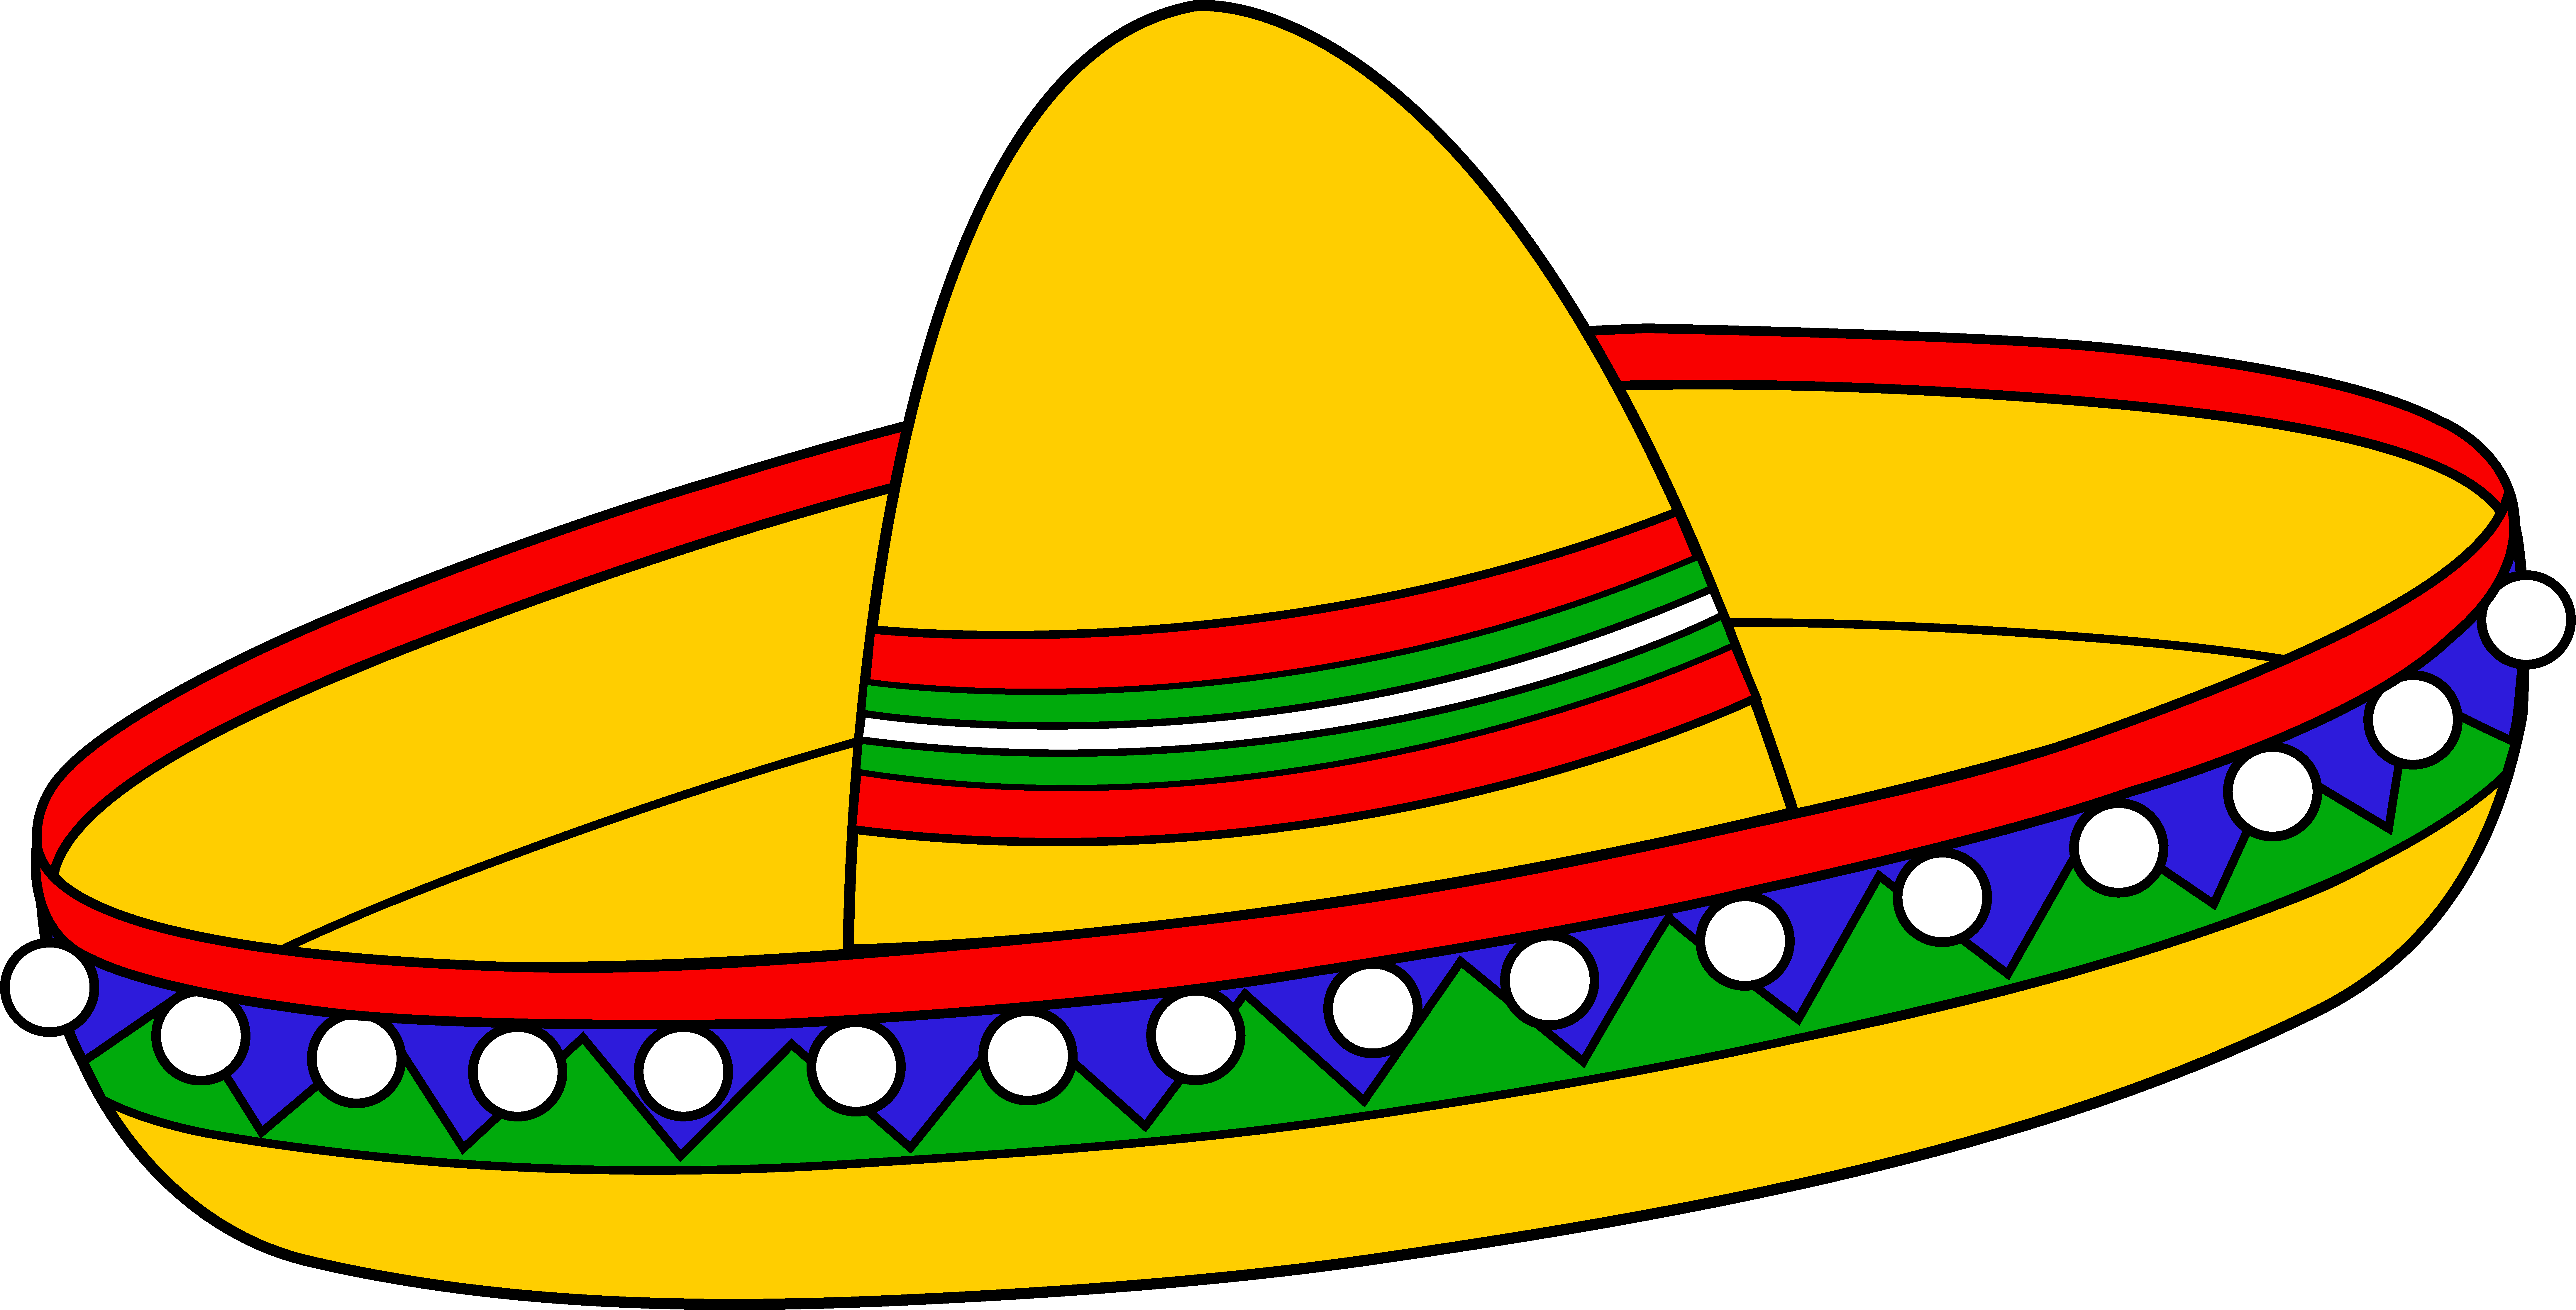 medium resolution of colorful mexican sombrero hat free clip art